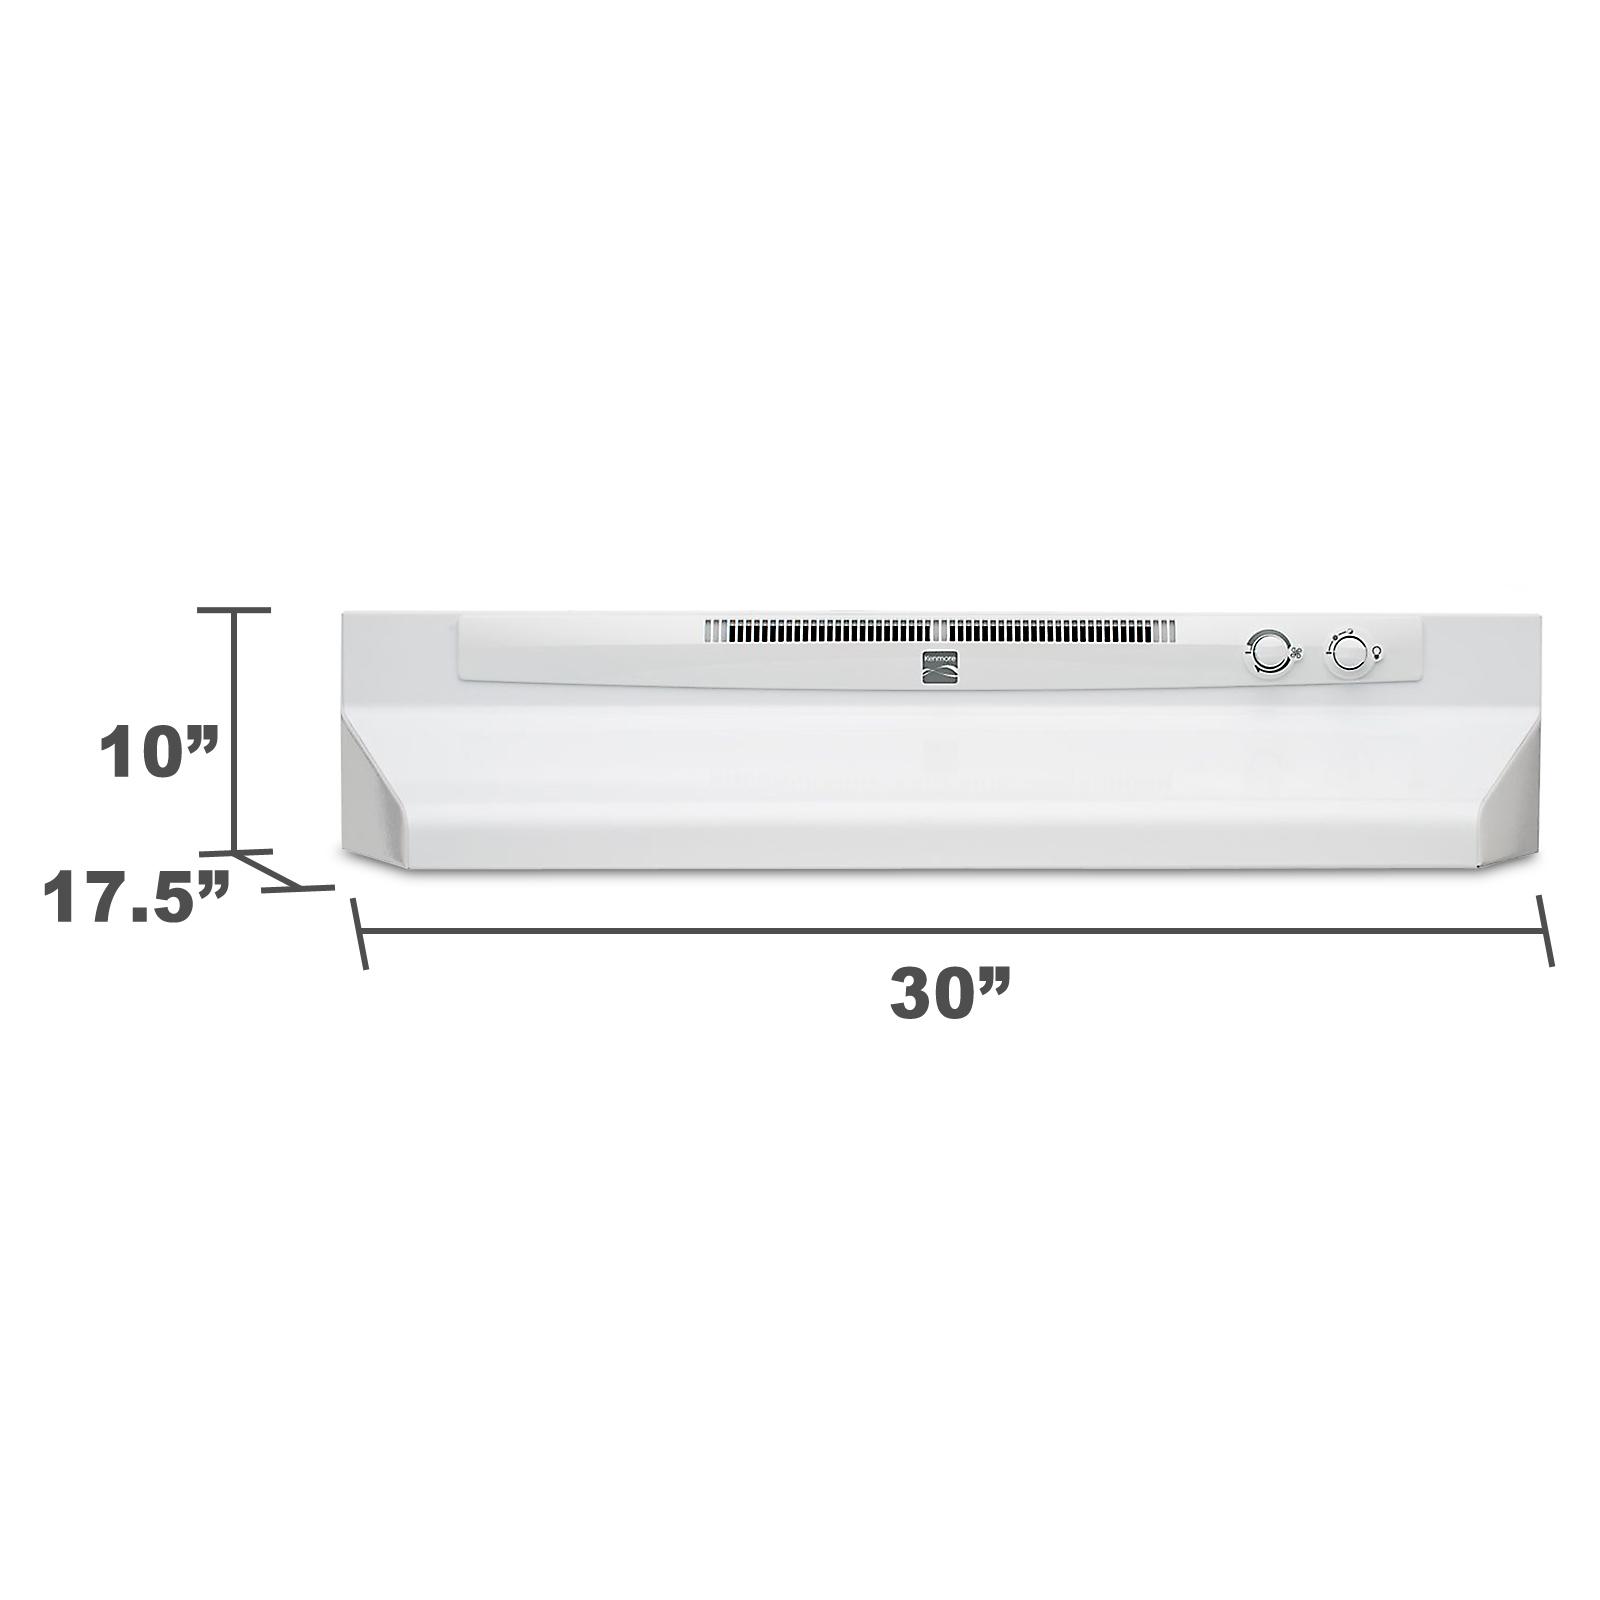 "Kenmore 52052 30"" Convertible Range Hood - White 52052"